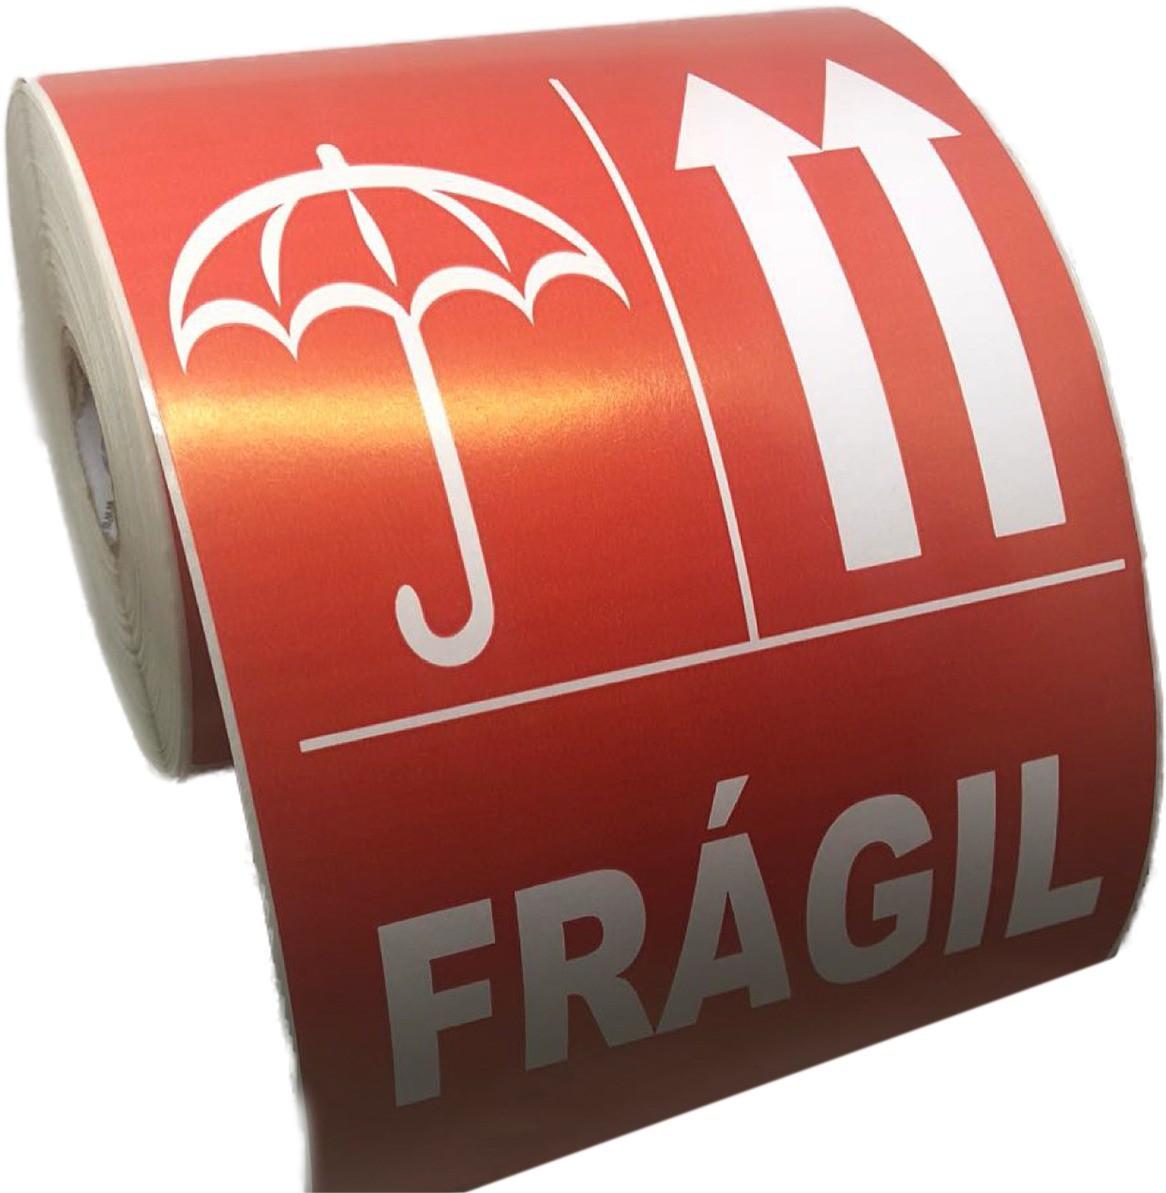 10 Rolos de Etiqueta Adesiva Selo Frágil 102mmX166mm